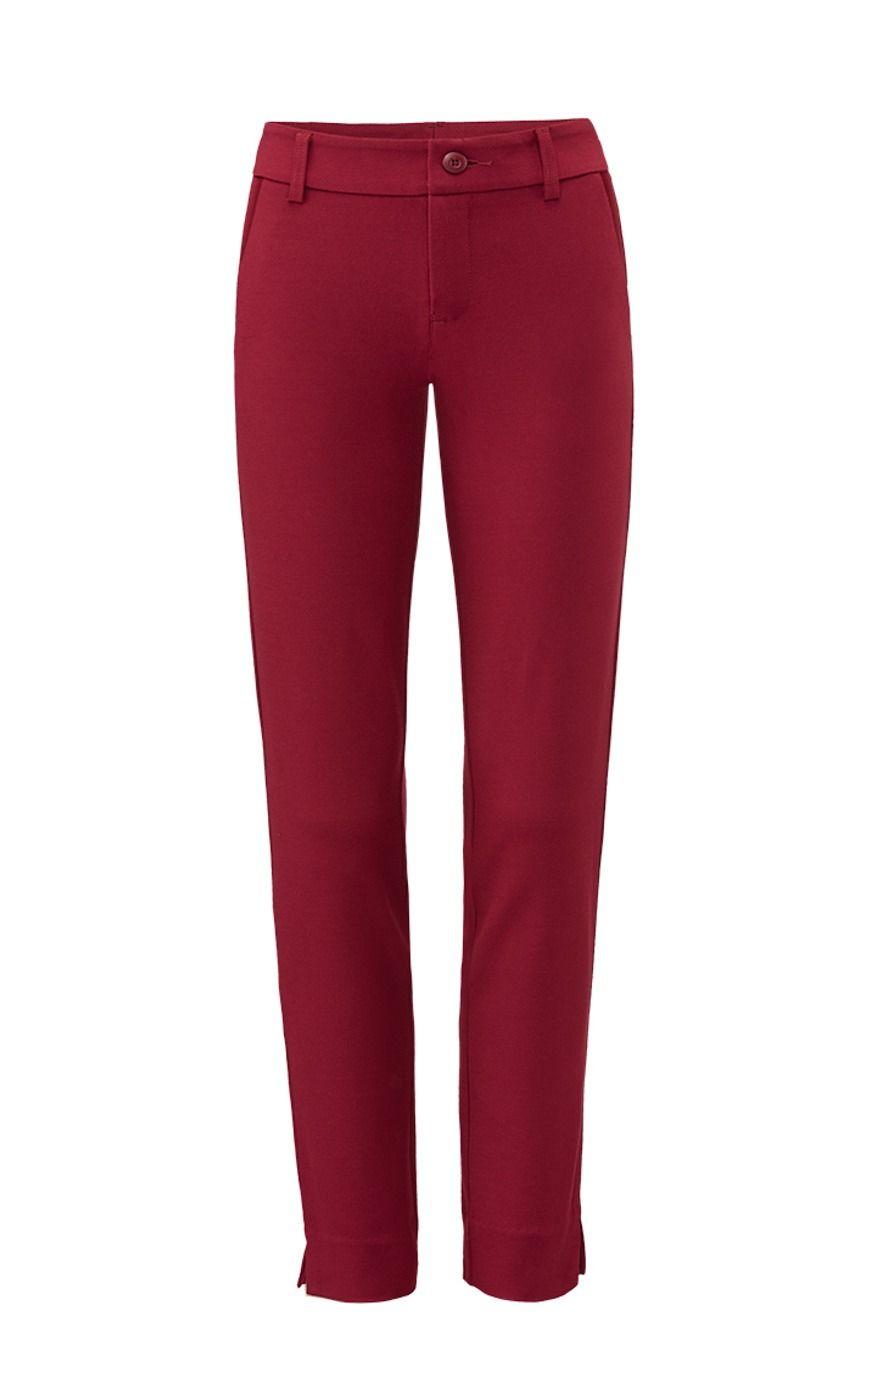 e9378c83de7400 cabi's Ava Trouser - Cabi Fall 2016 Collection   Clothes   Capsule ...